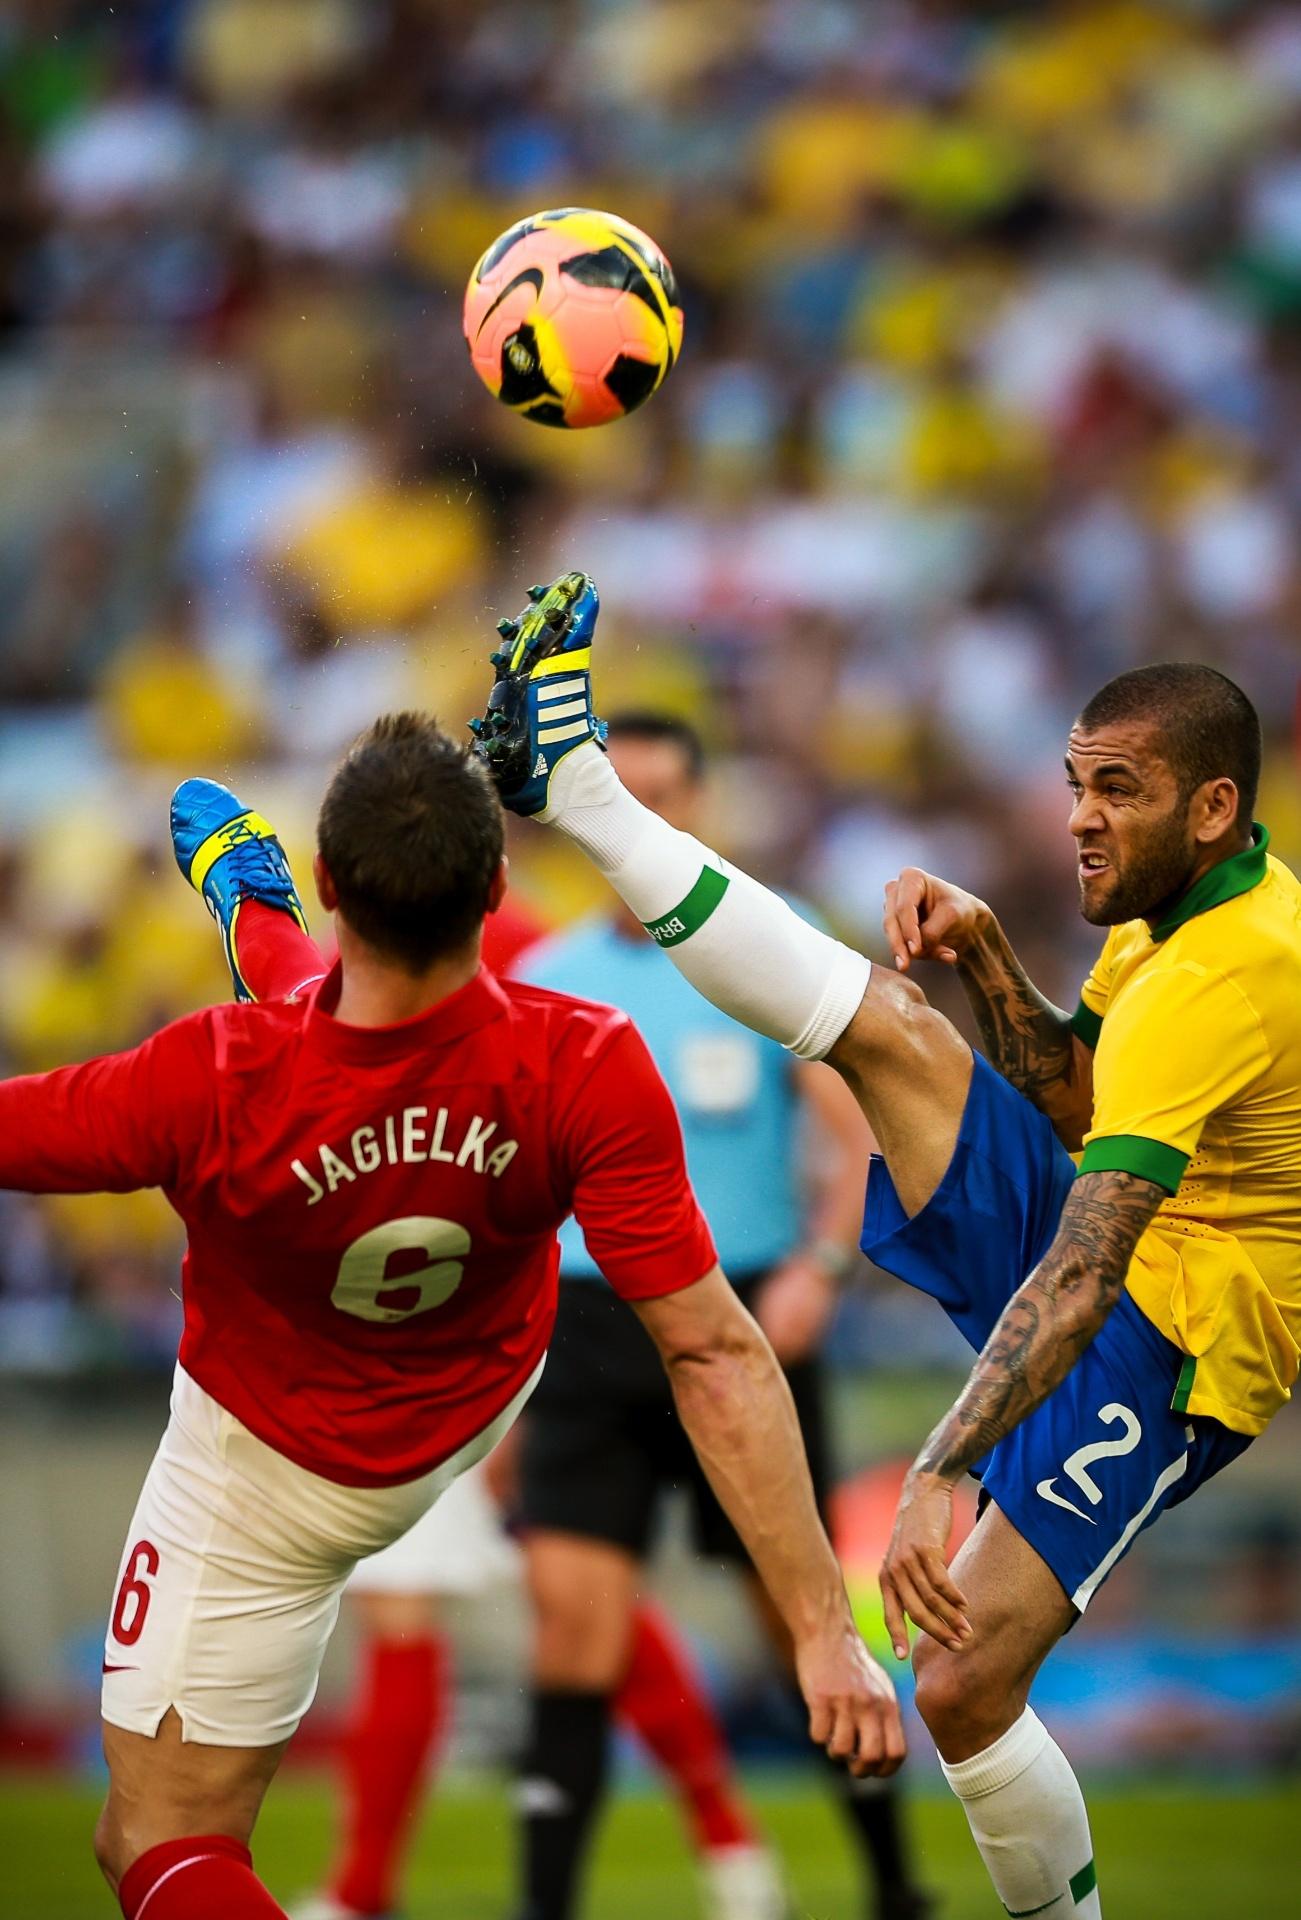 02.jun.2013 - Daniel Alves divide bola com Jagielka no amistoso entre Brasil e Inglaterra no Maracanã